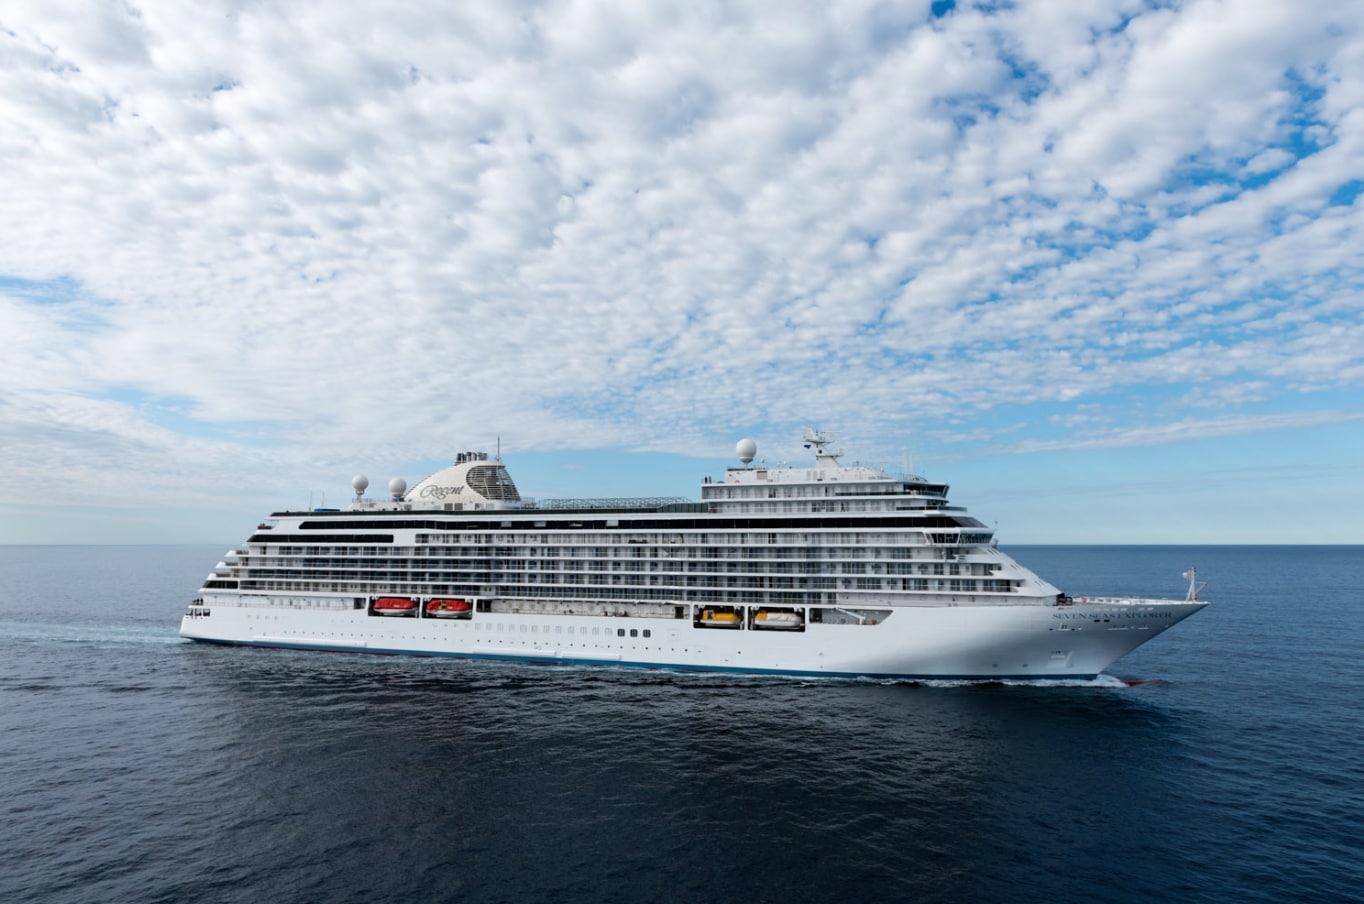 Energy cruise